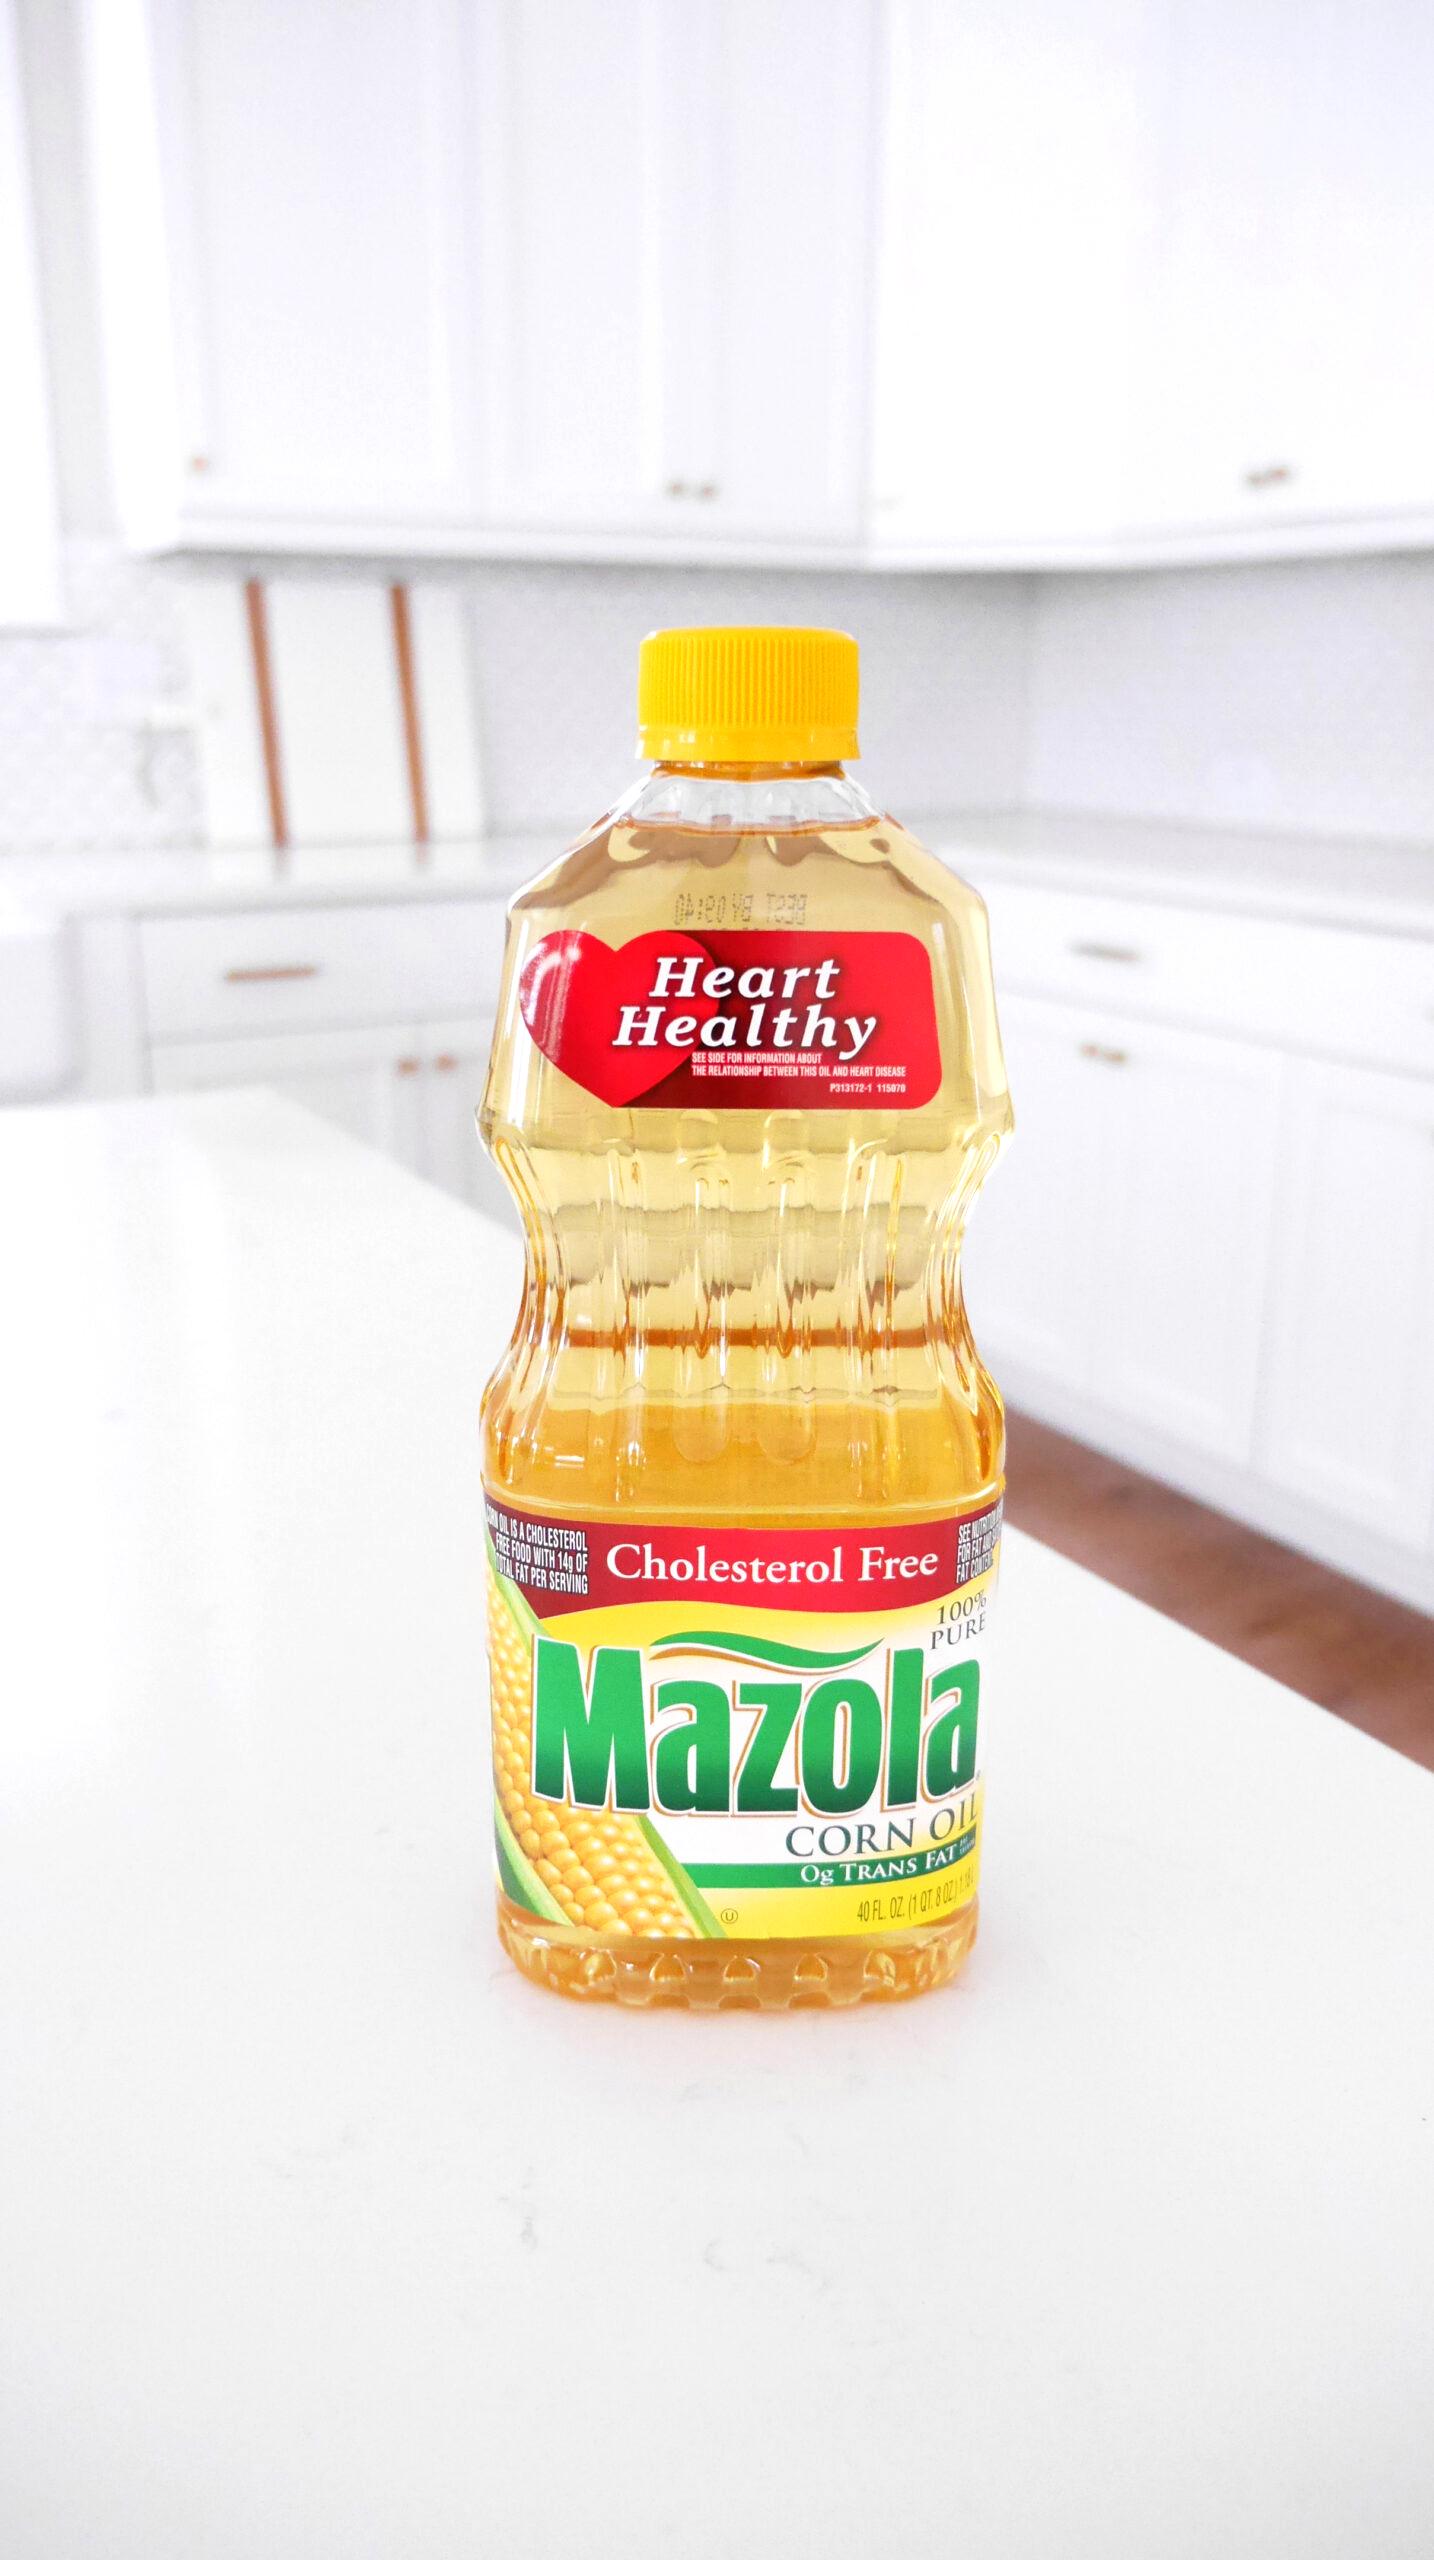 heart healthy Mazola Corn Oil